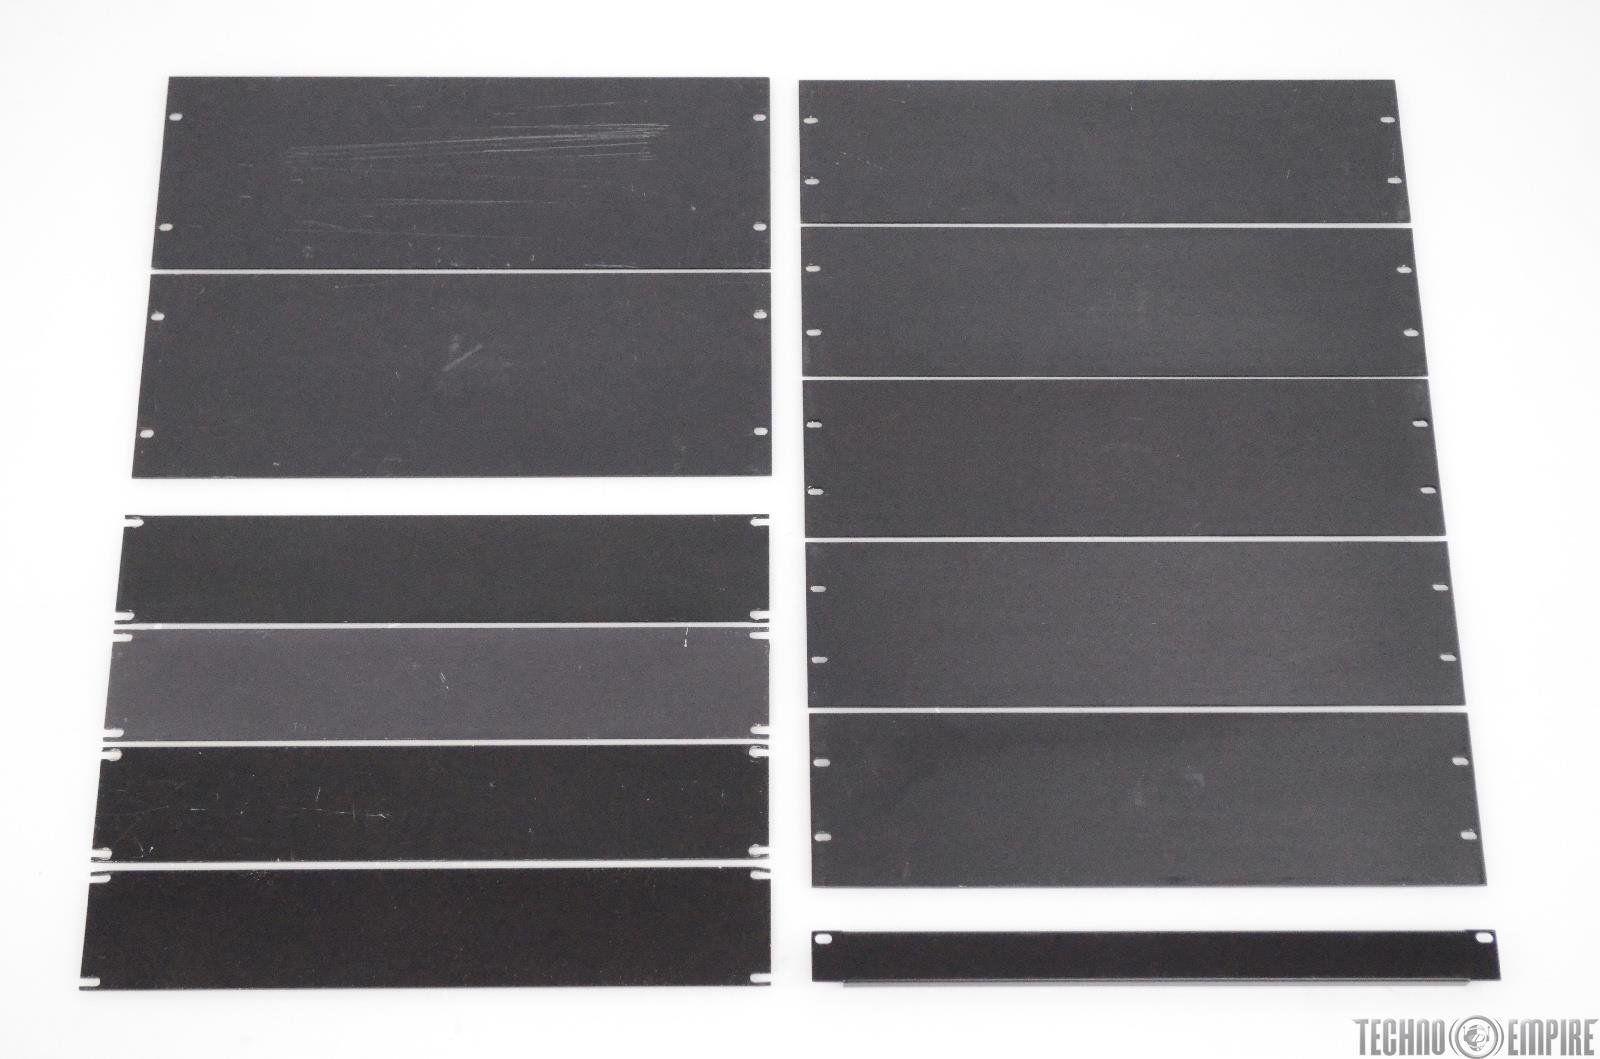 12 Blank 1U 2U 3U 4U Rack Panels Lot 1 2 3 4 Space Rackmount #31735